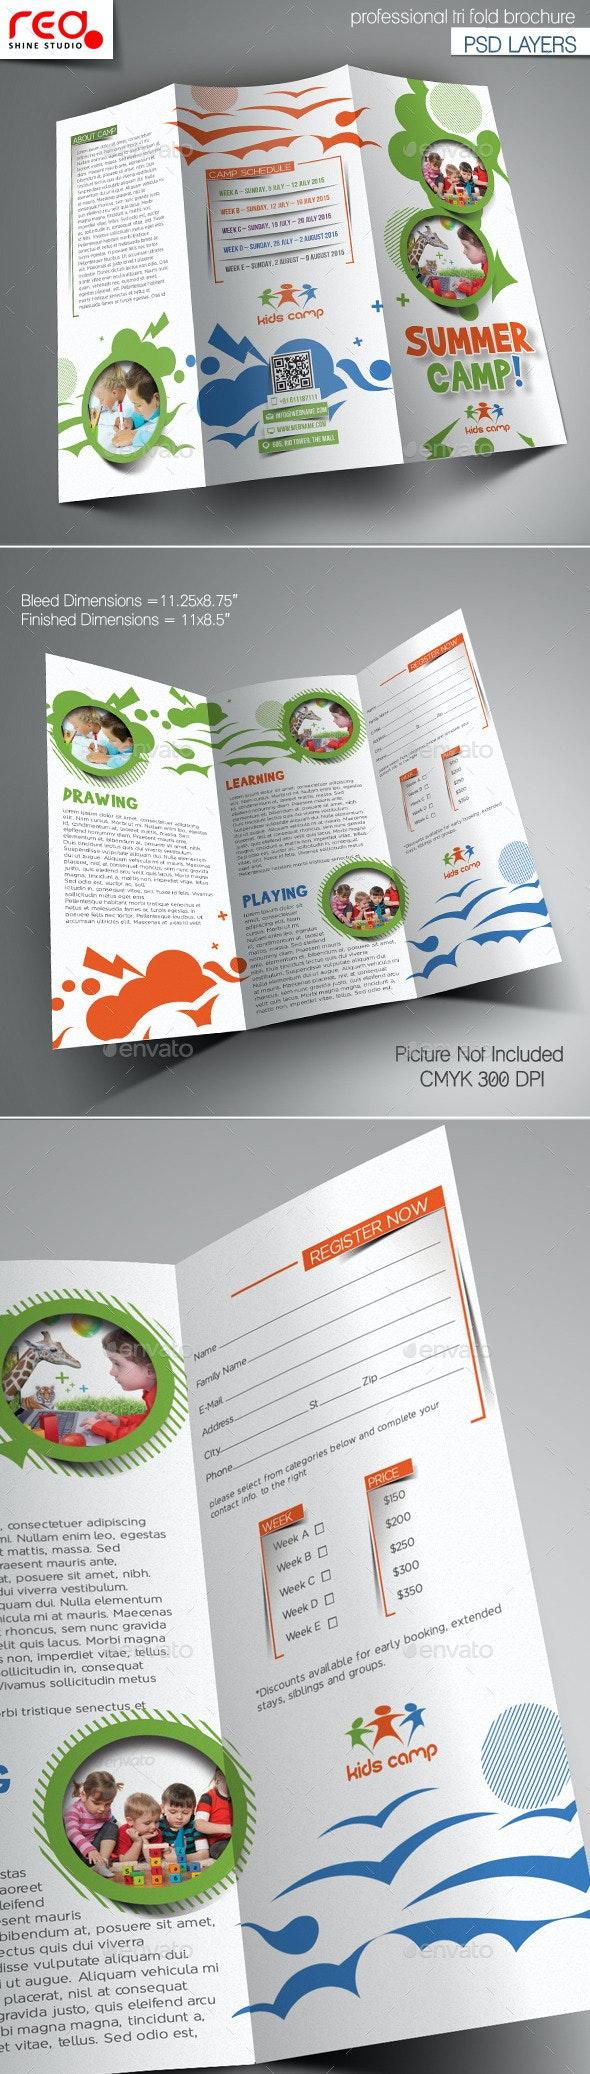 Summer Camp Trifold Brochure Template - Brochures Print Templates